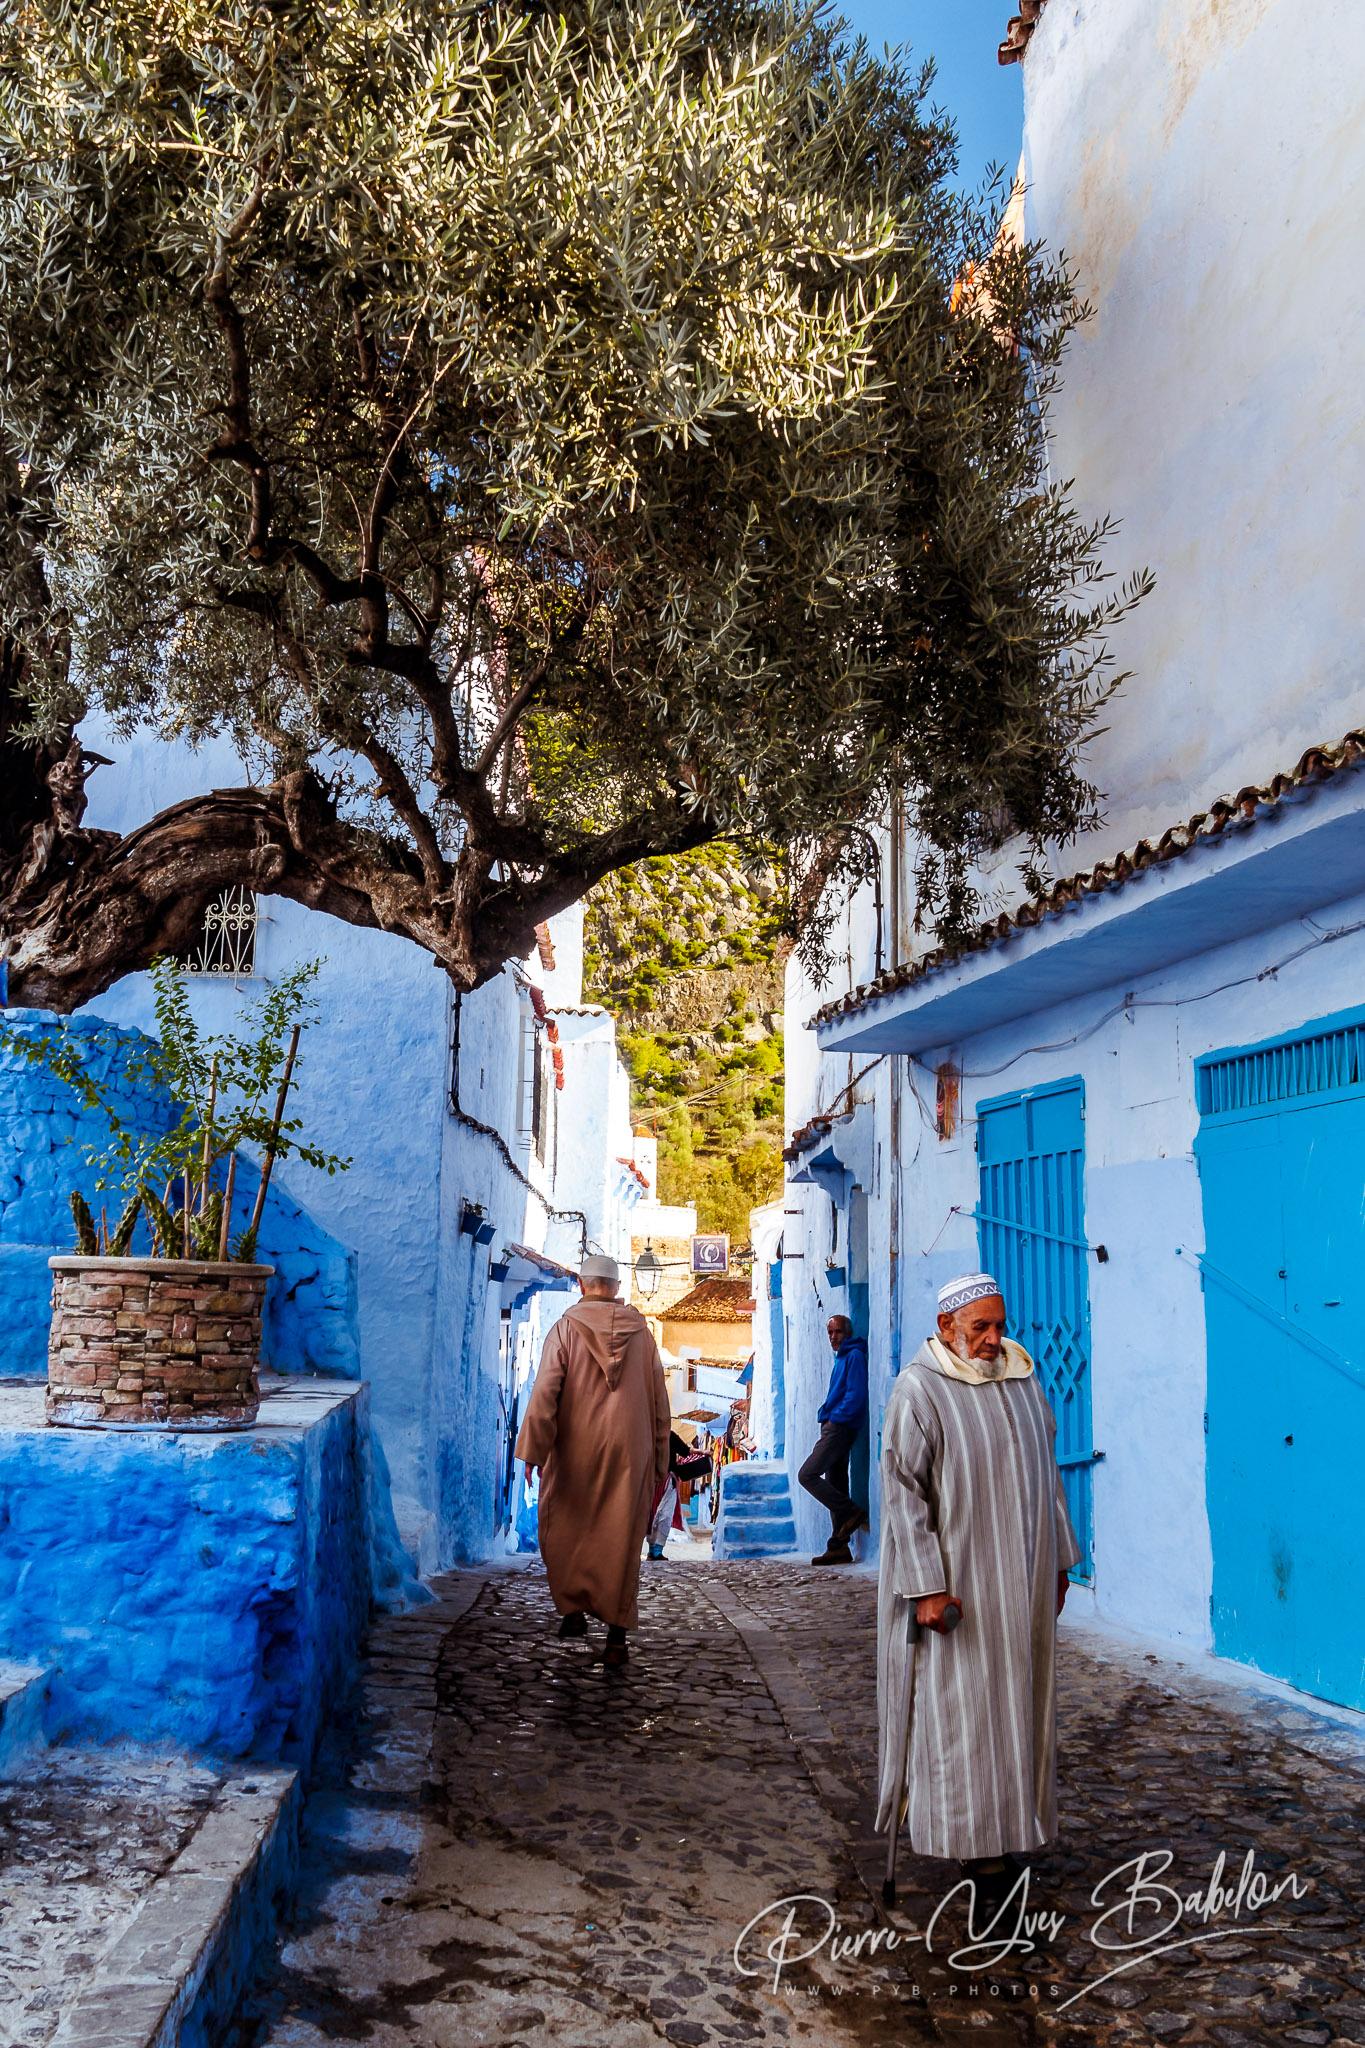 Marocains sous l'olivier dans la medina de Chefchaouen, Maroc